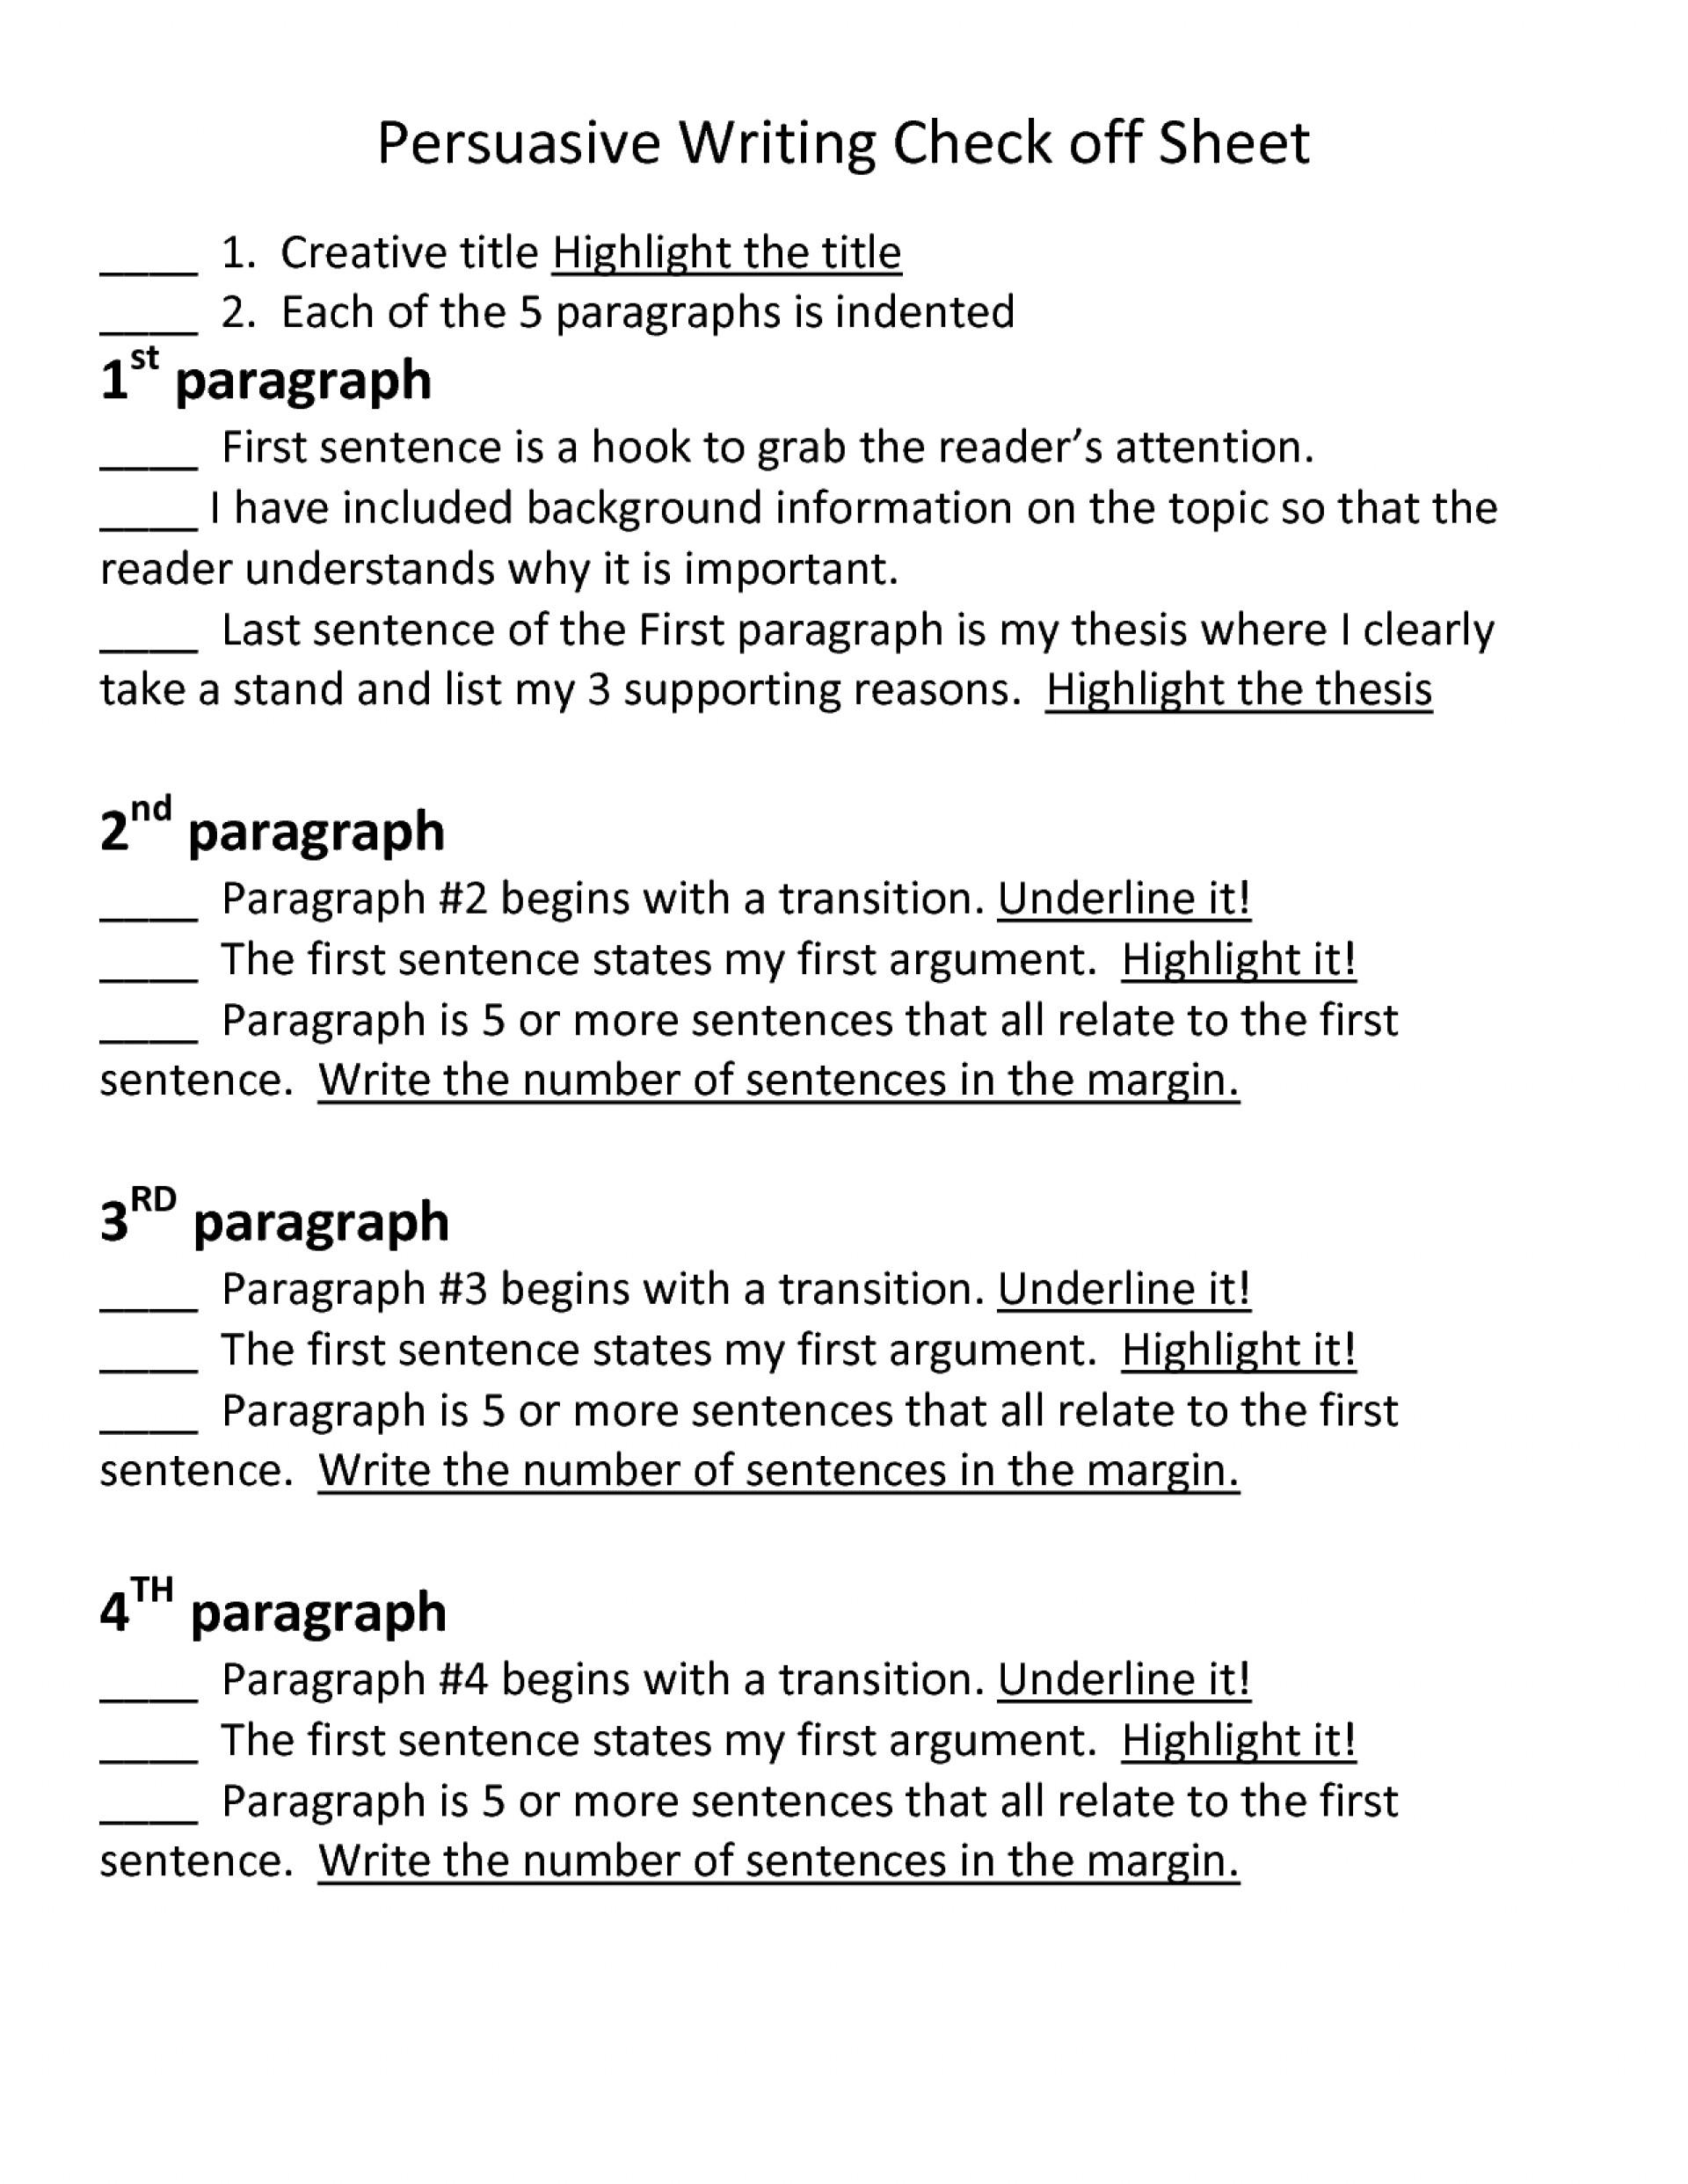 008 Paragraph Essay Example Top 3 Writing Narrative Sample 1920